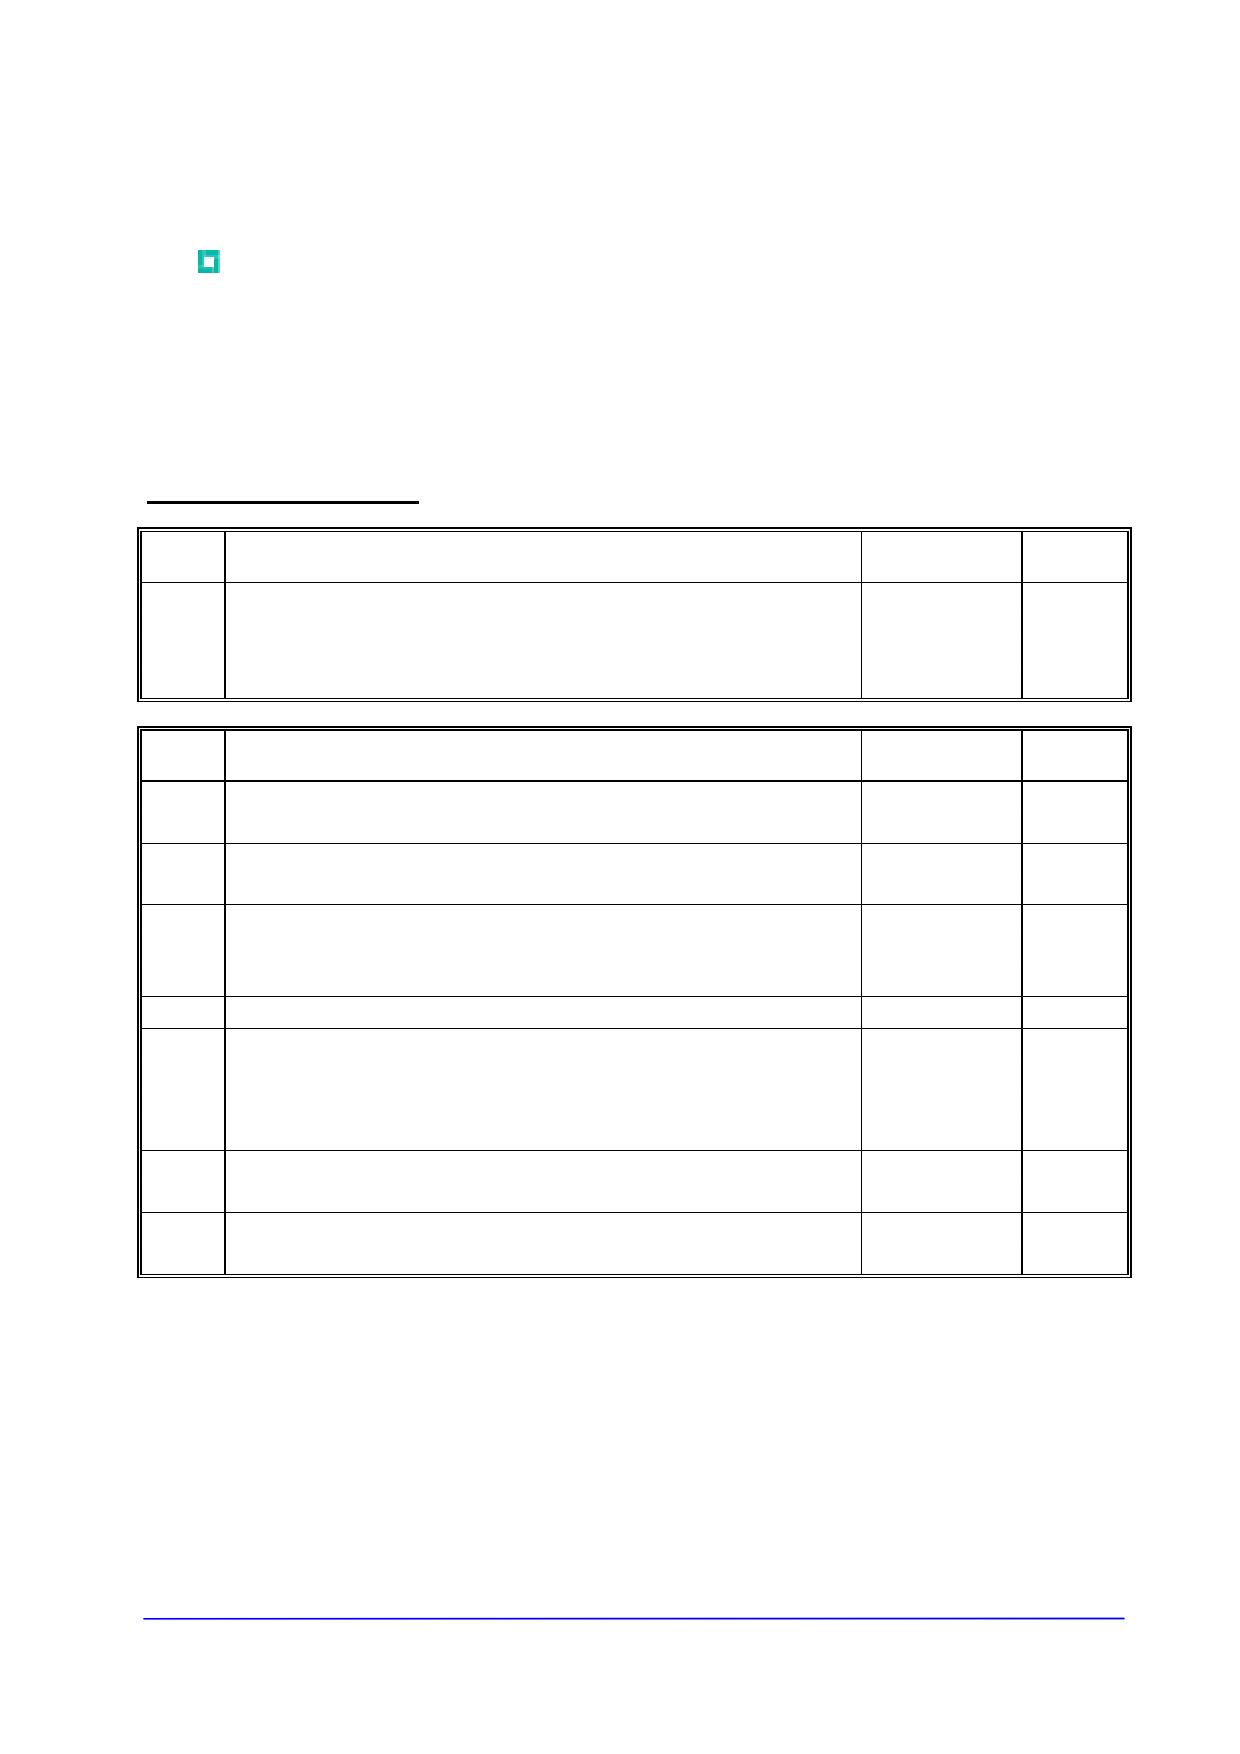 H0500KC25S Datasheet, H0500KC25S PDF,ピン配置, 機能